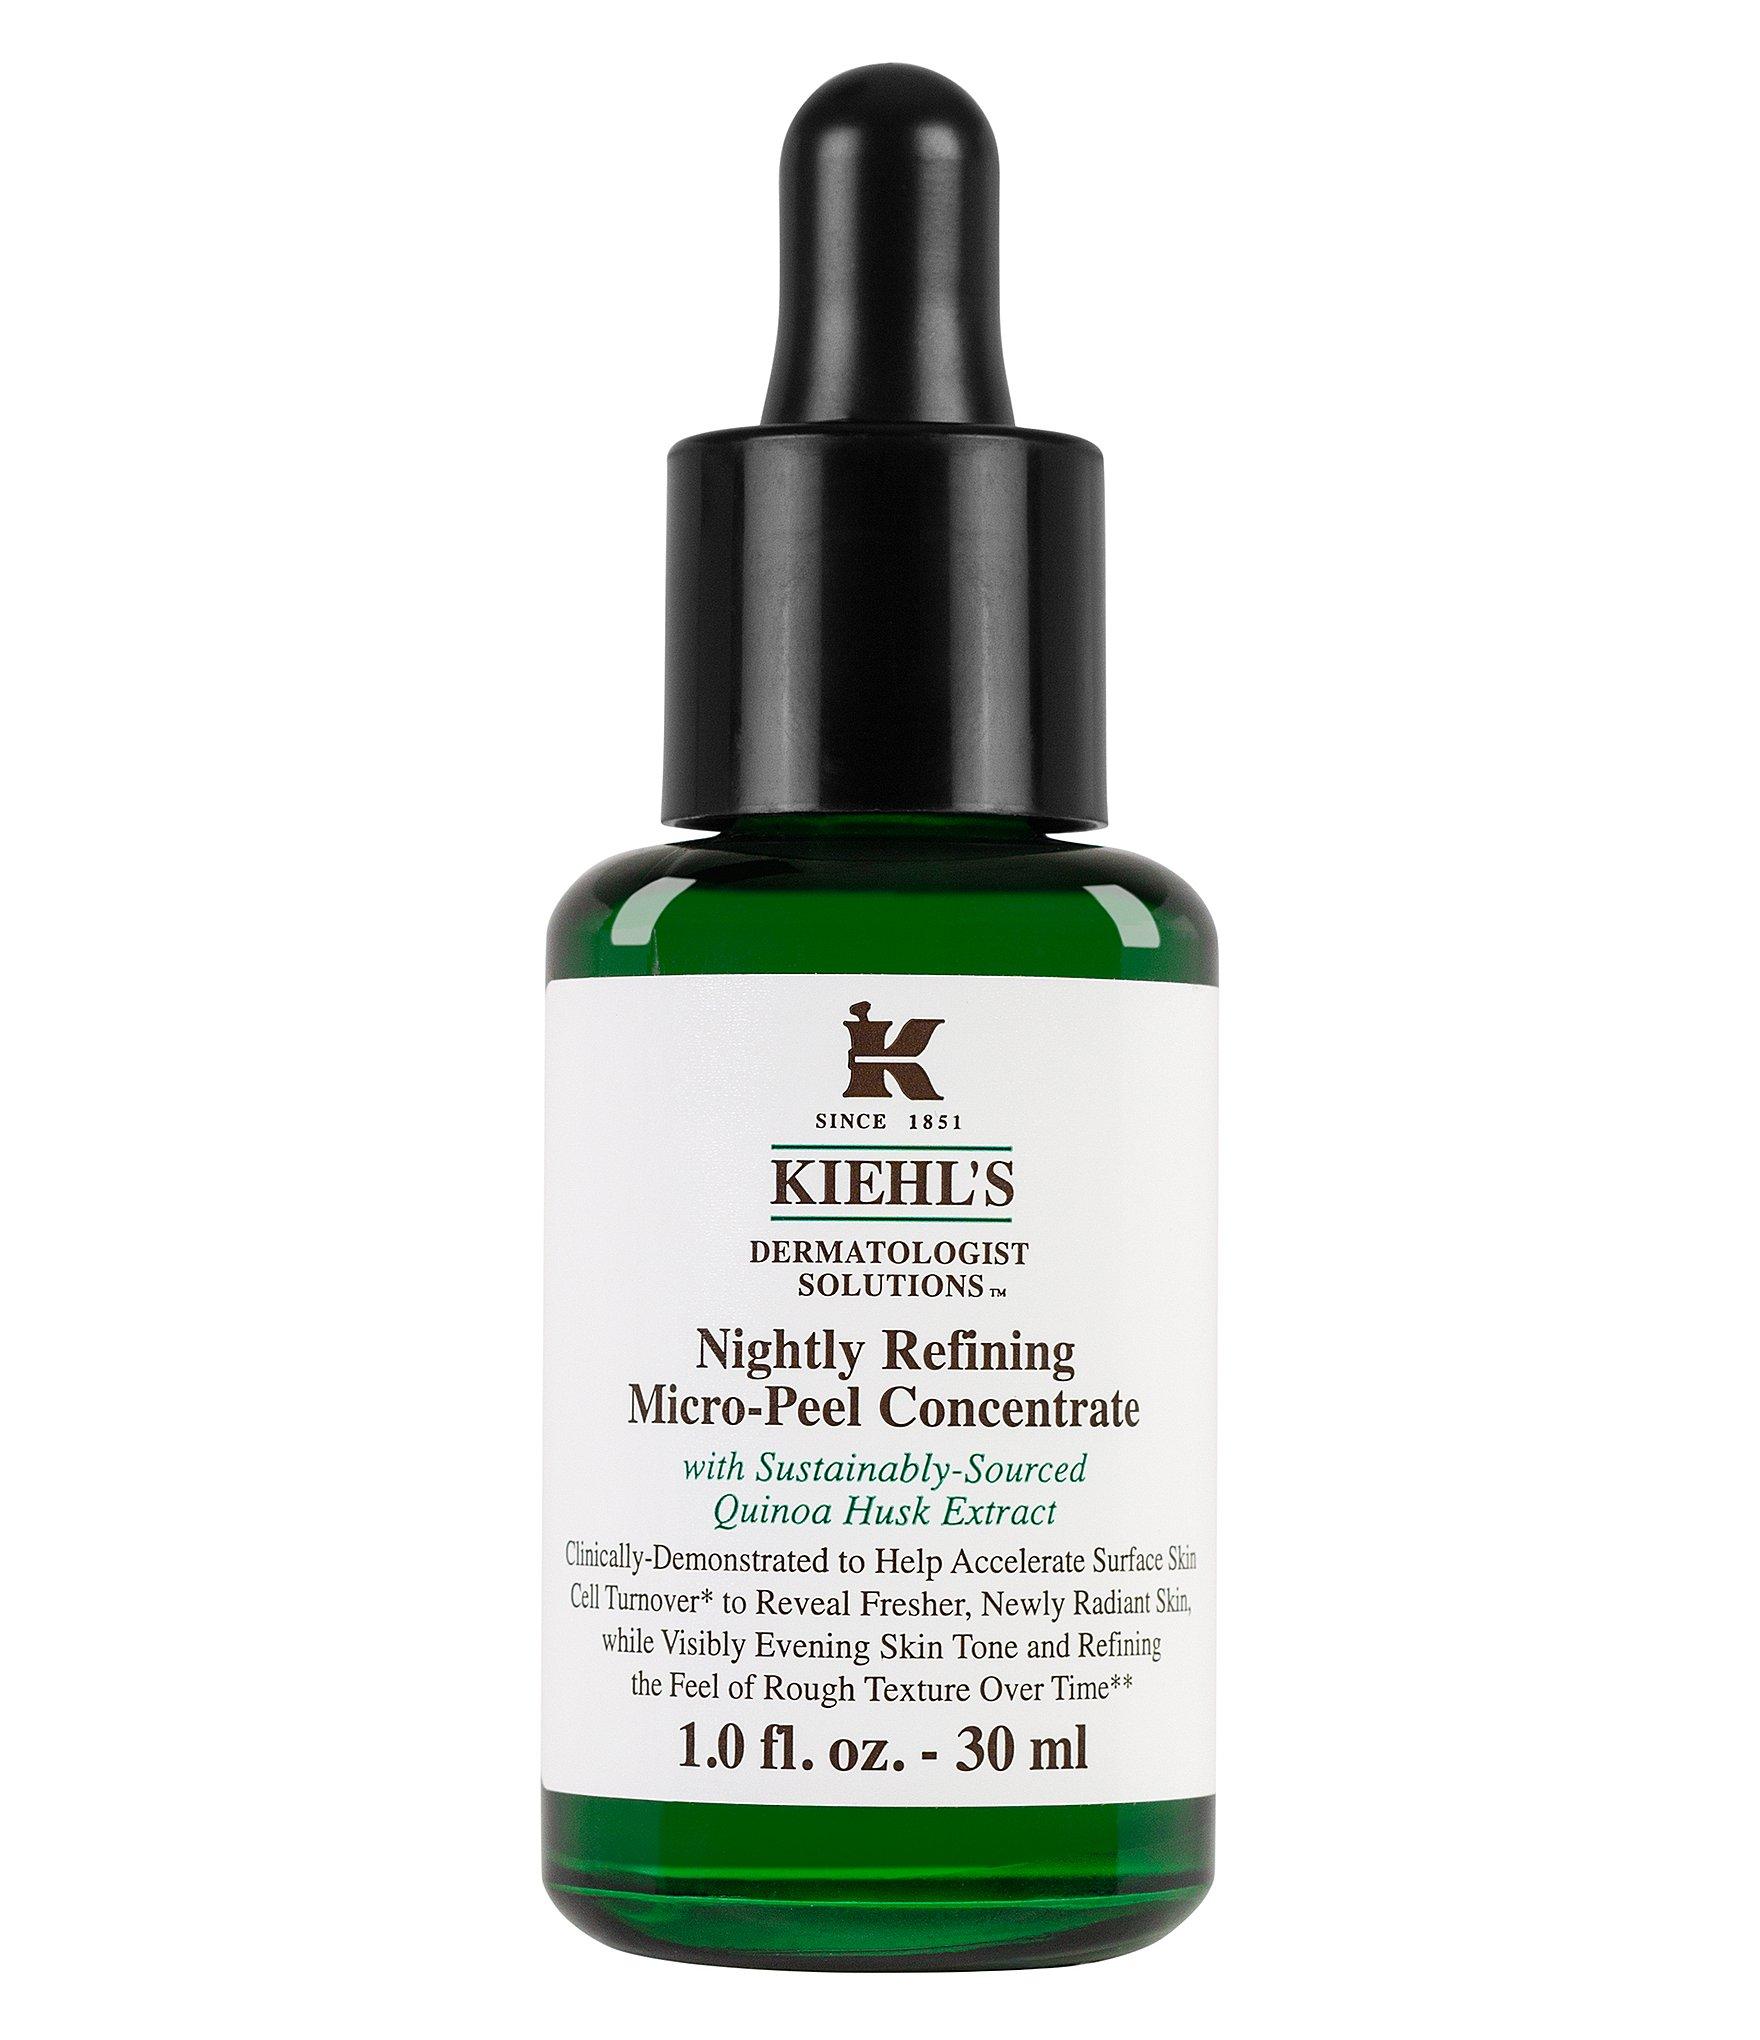 Косметика Kiehl's - пилинги, обновление клеток кожи, отшелушивание клеток кожи, пилинги